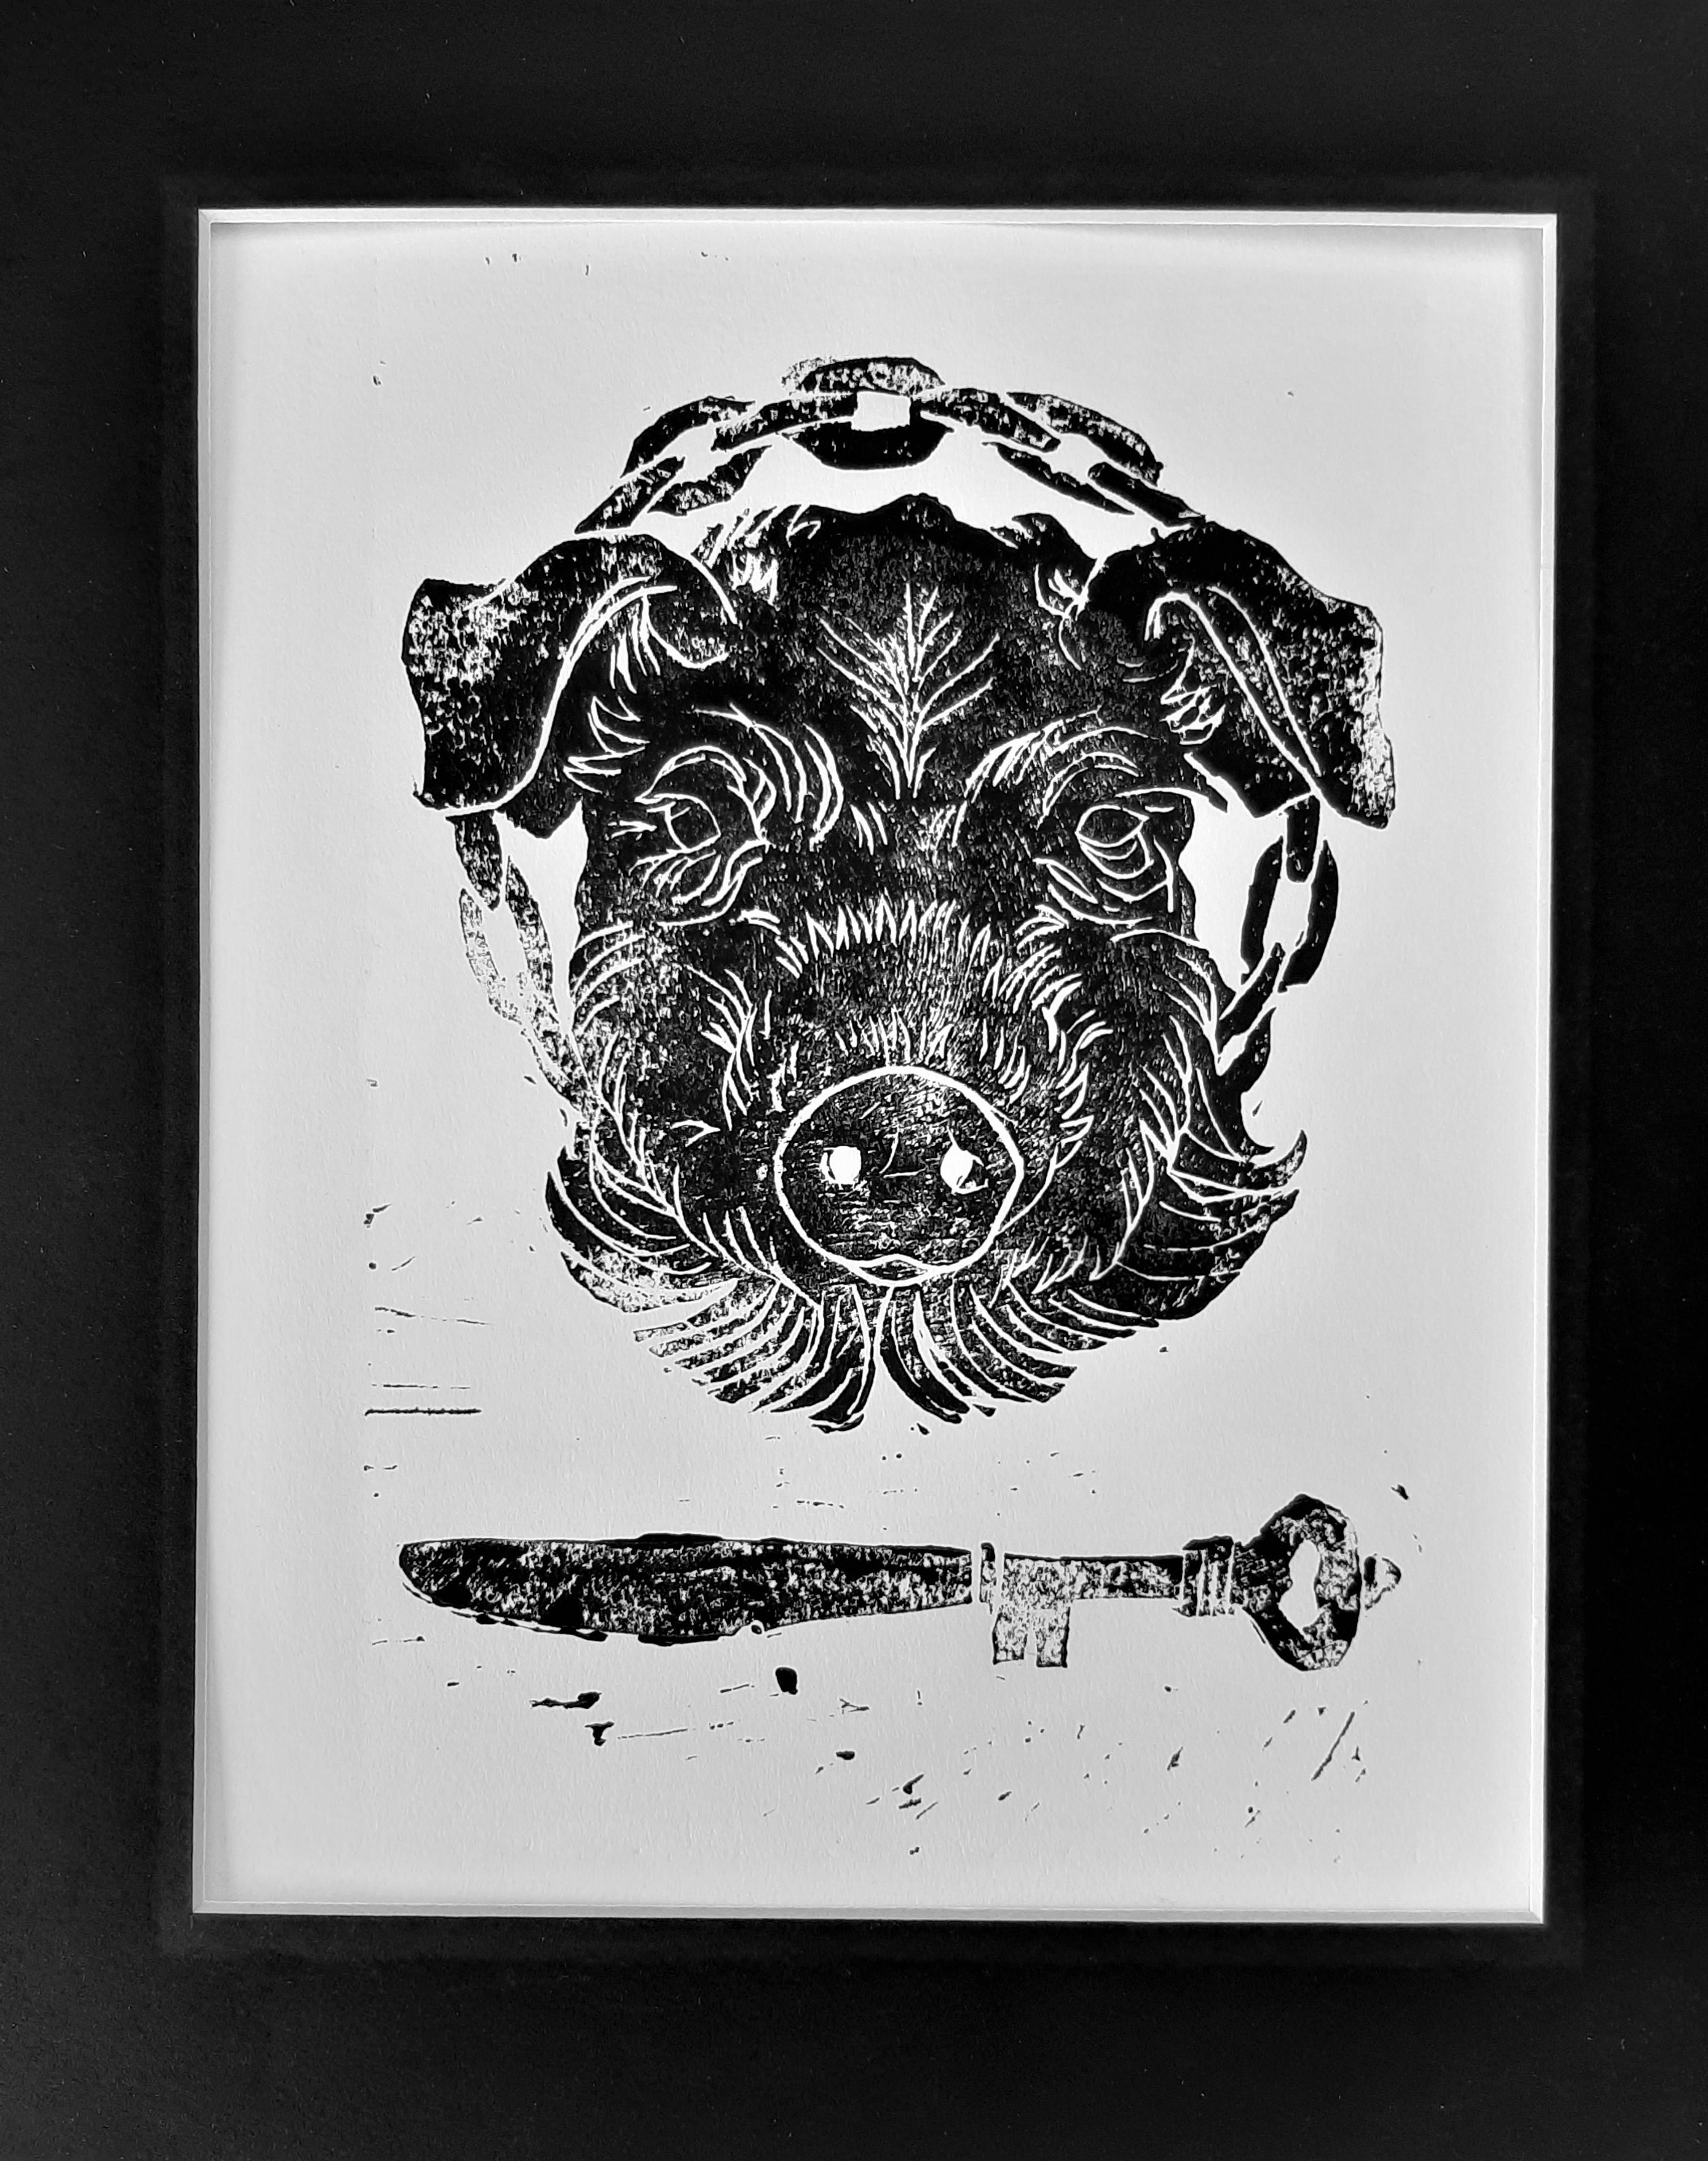 Wilbur - 11 x 14 - Ink on Cold Press Paper - $130